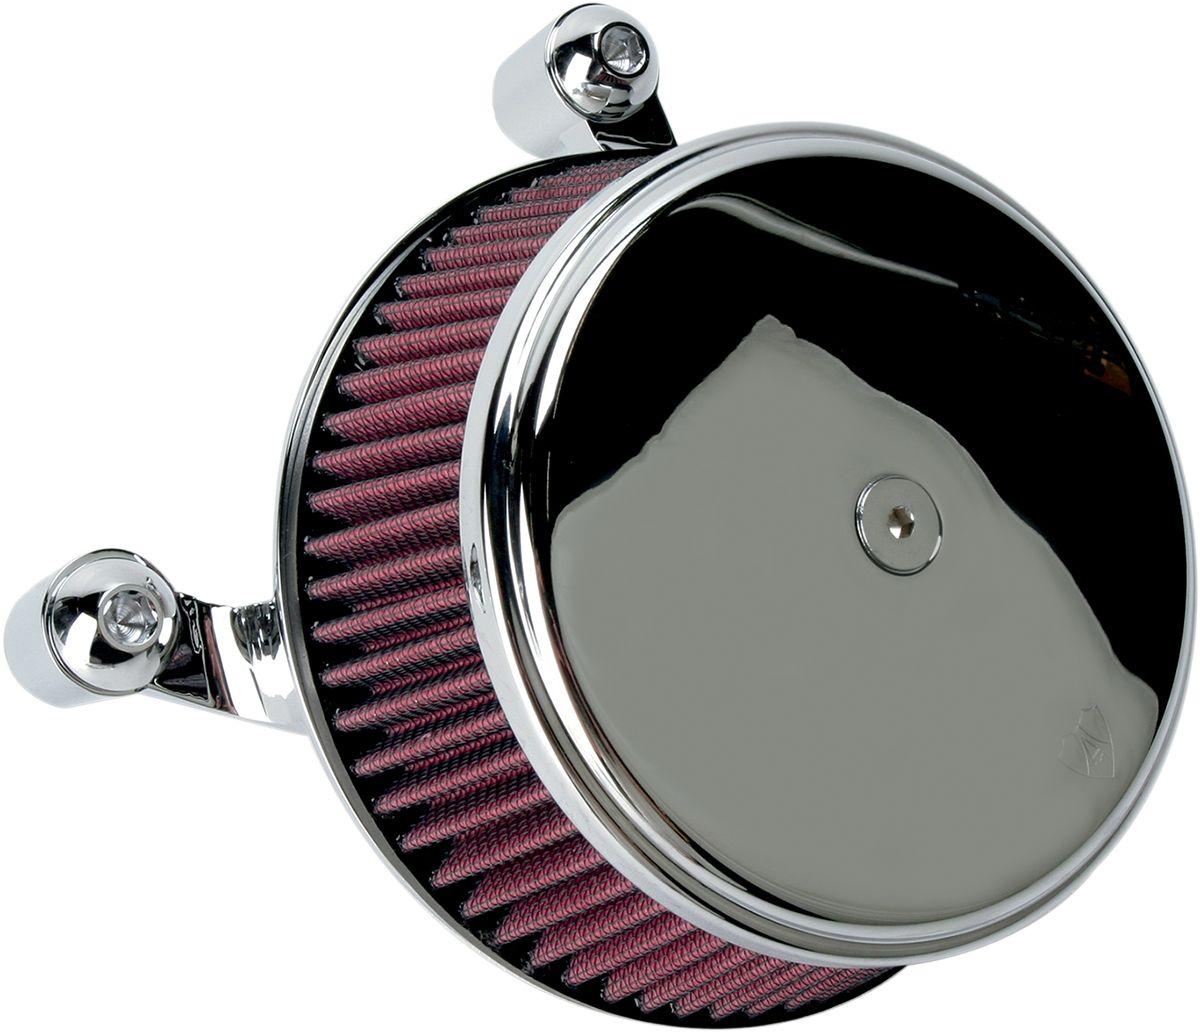 【ARLEN NESS】空氣濾清器總成 空氣濾清器總成1 CVR 99-01FLT - 「Webike-摩托百貨」